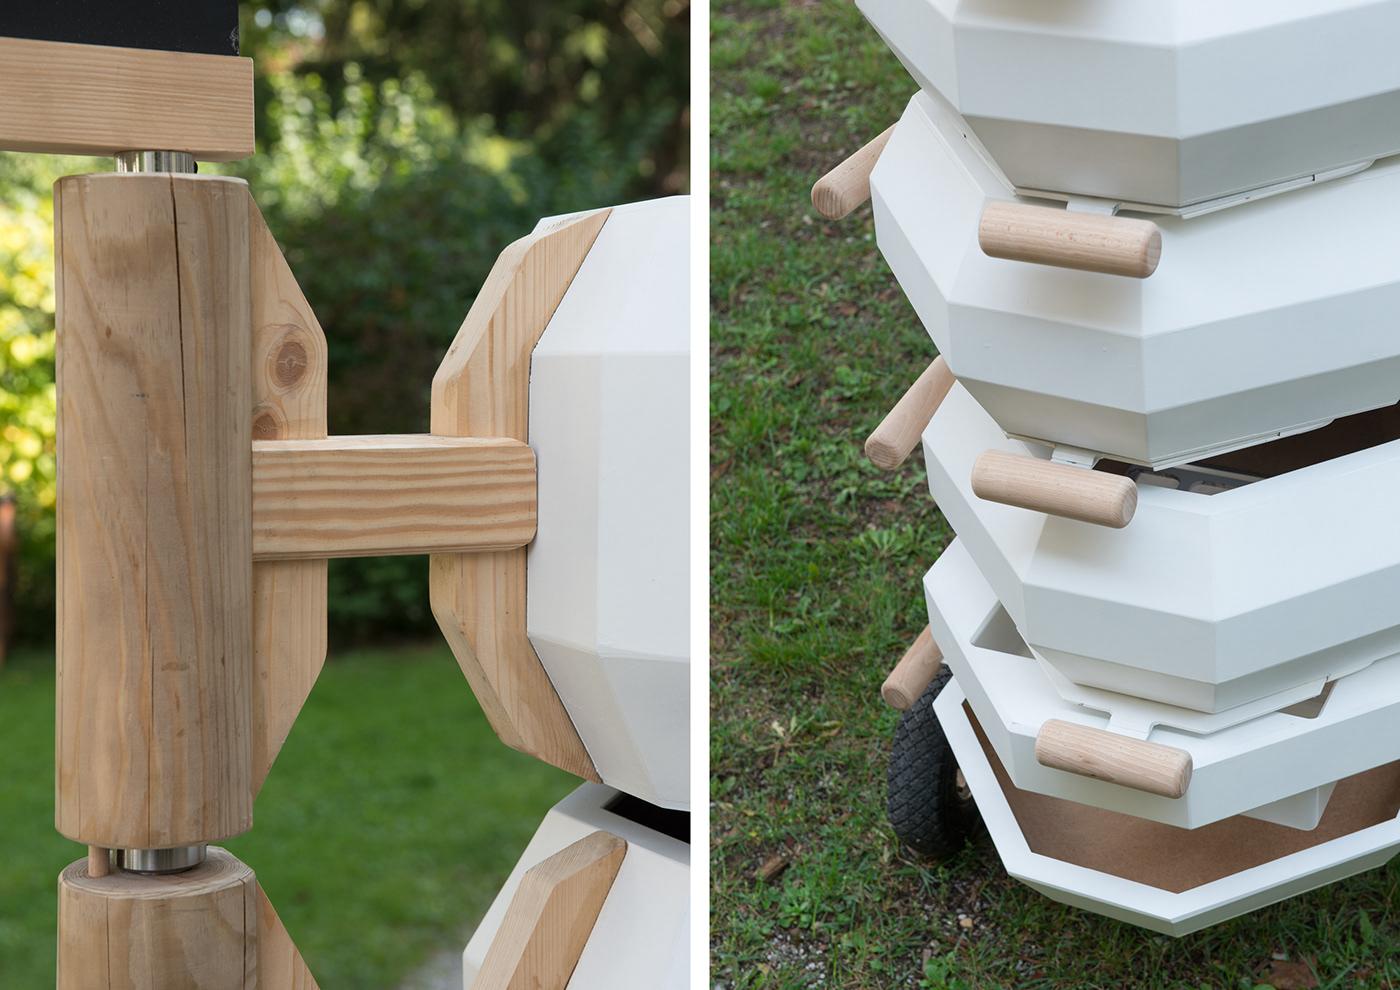 Mealworms foodtruck product design  future food Sustainable Design Food  industrial design  social design University future life